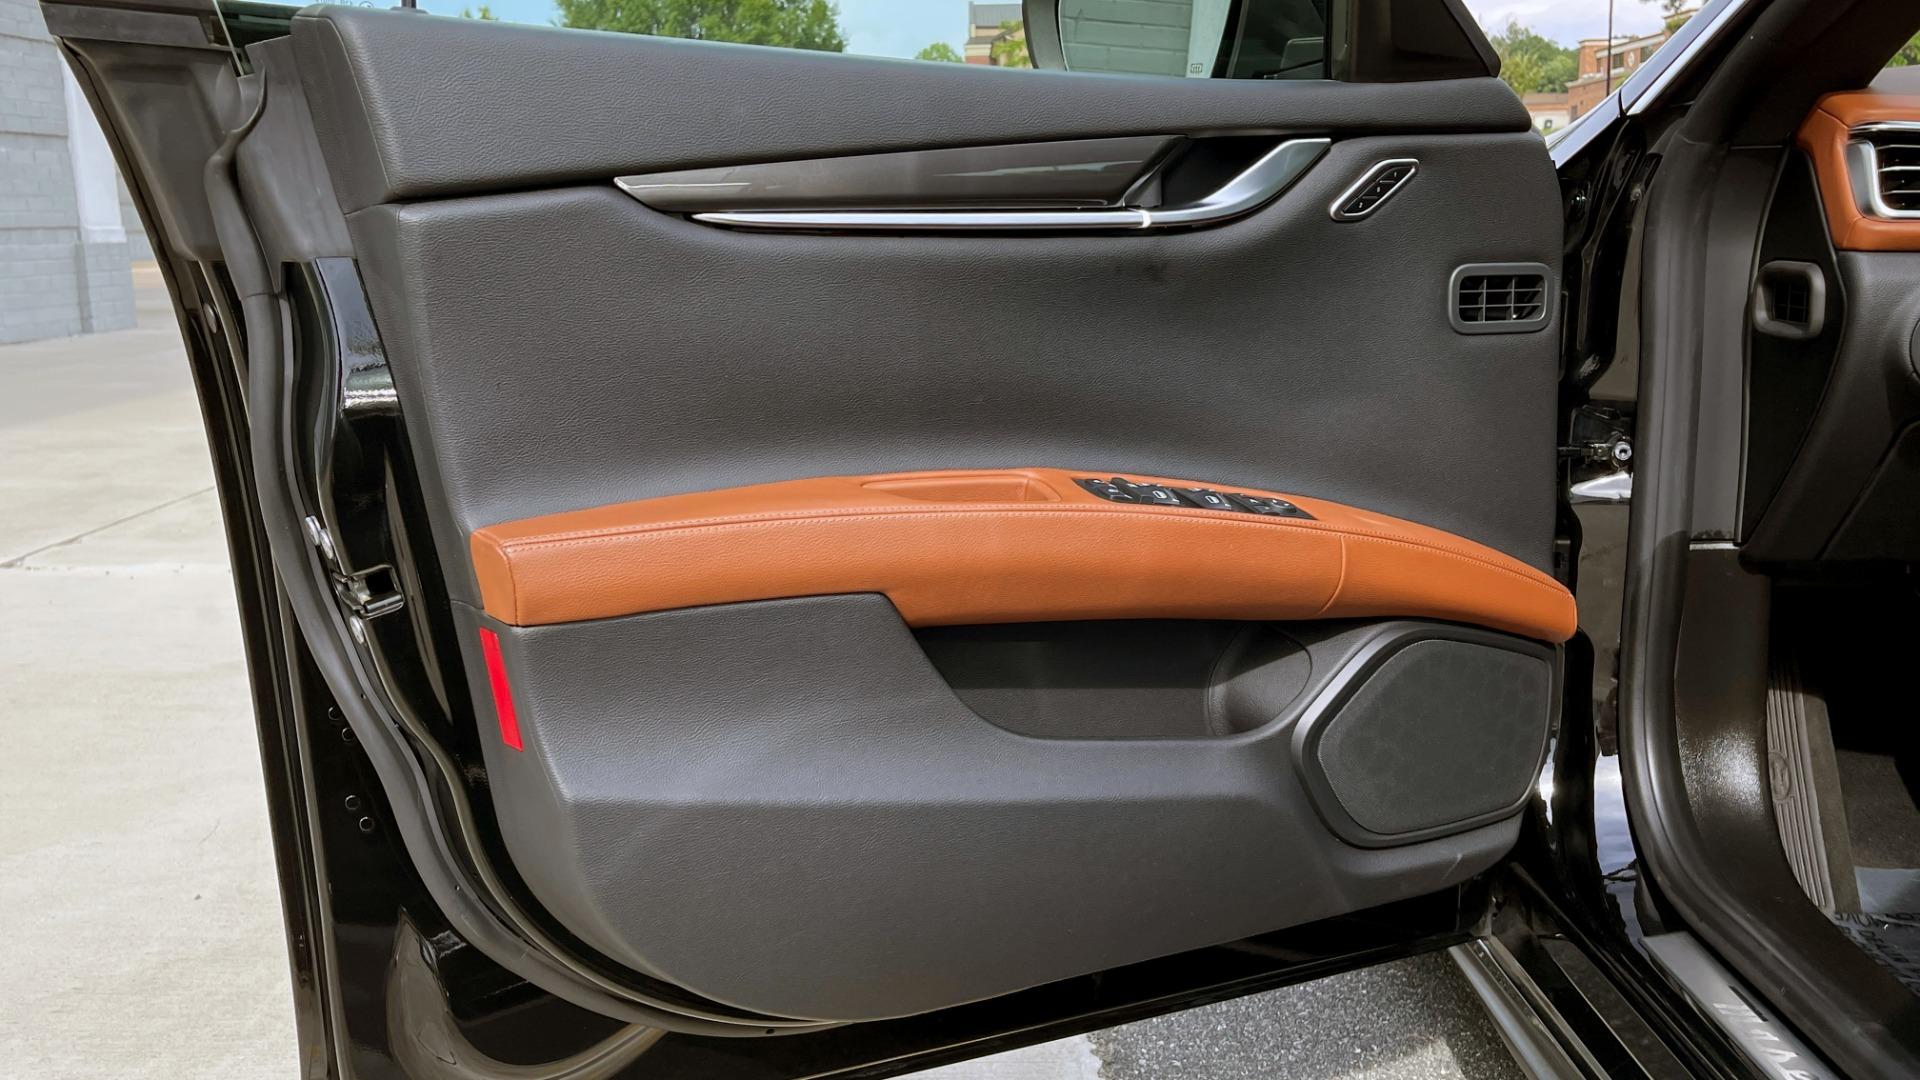 Used 2018 Maserati GHIBLI 3.0L SEDAN / 8-SPD AUTO / NAV / SUNROOF / REARVIEW for sale $42,995 at Formula Imports in Charlotte NC 28227 27